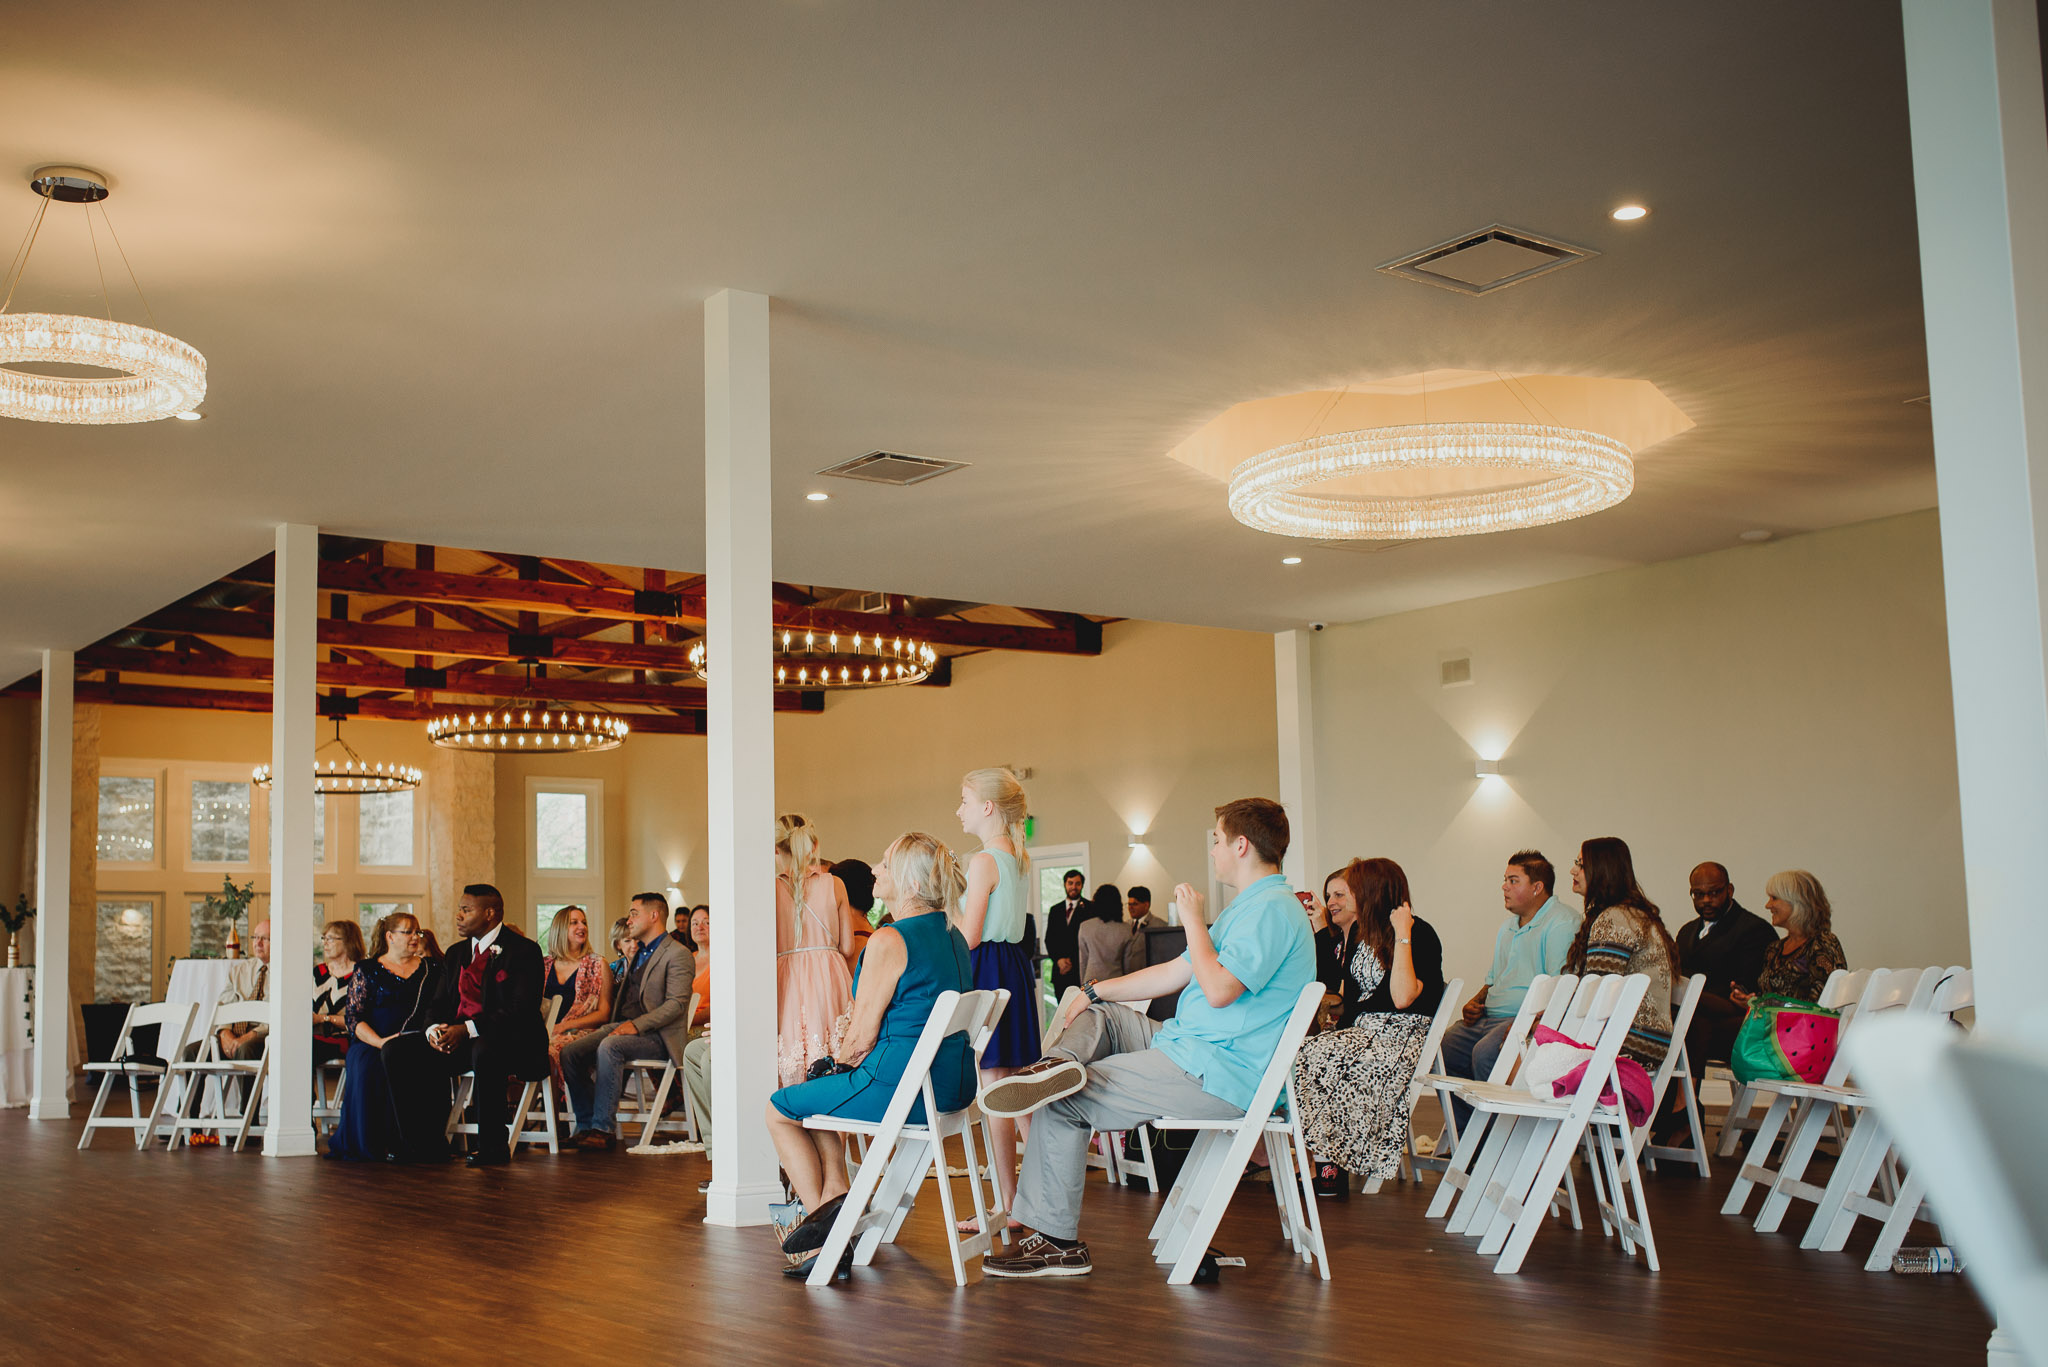 Austin-Texas-Wedding-Vintage-Villas-0006-2.jpg